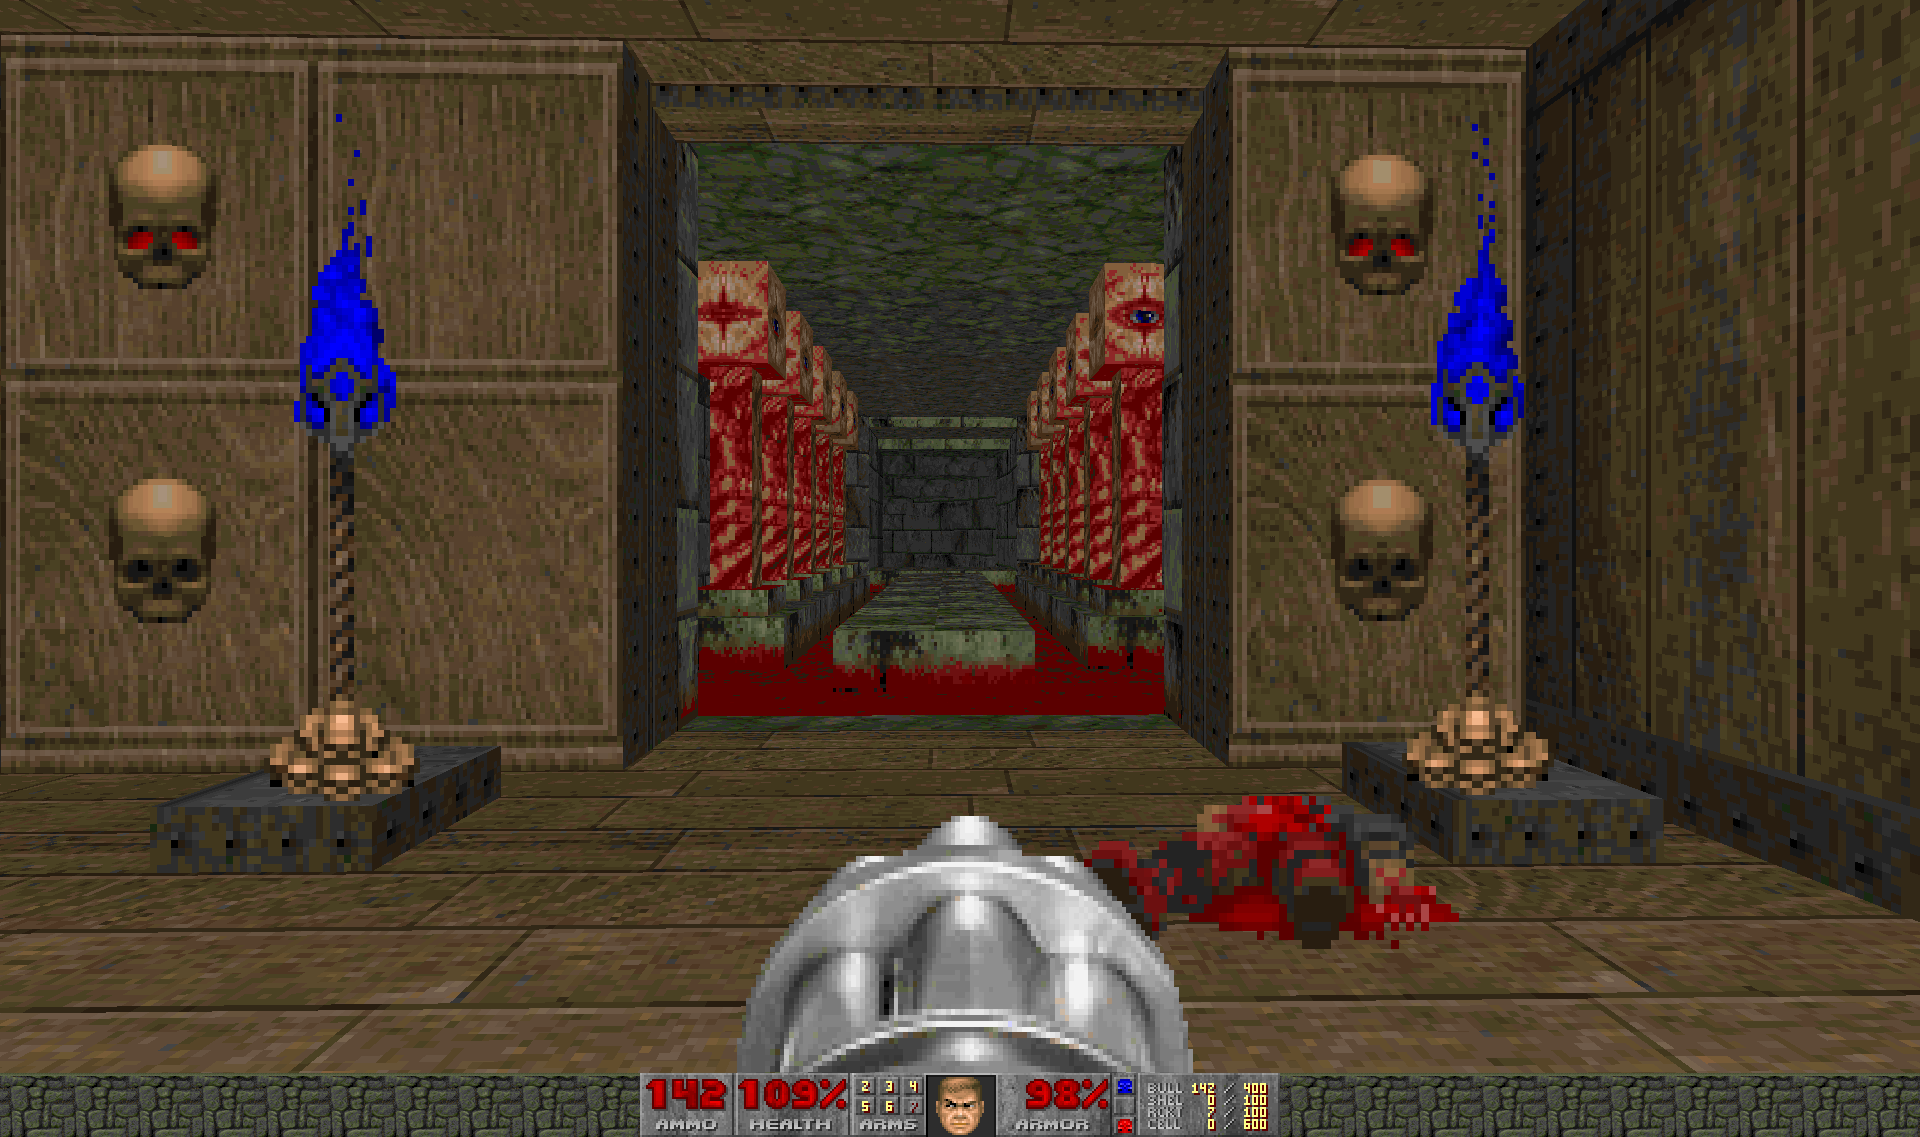 Screenshot_Doom_20210325_125716.png.88e4542f62e07b044f7f4e58eb46b4b5.png